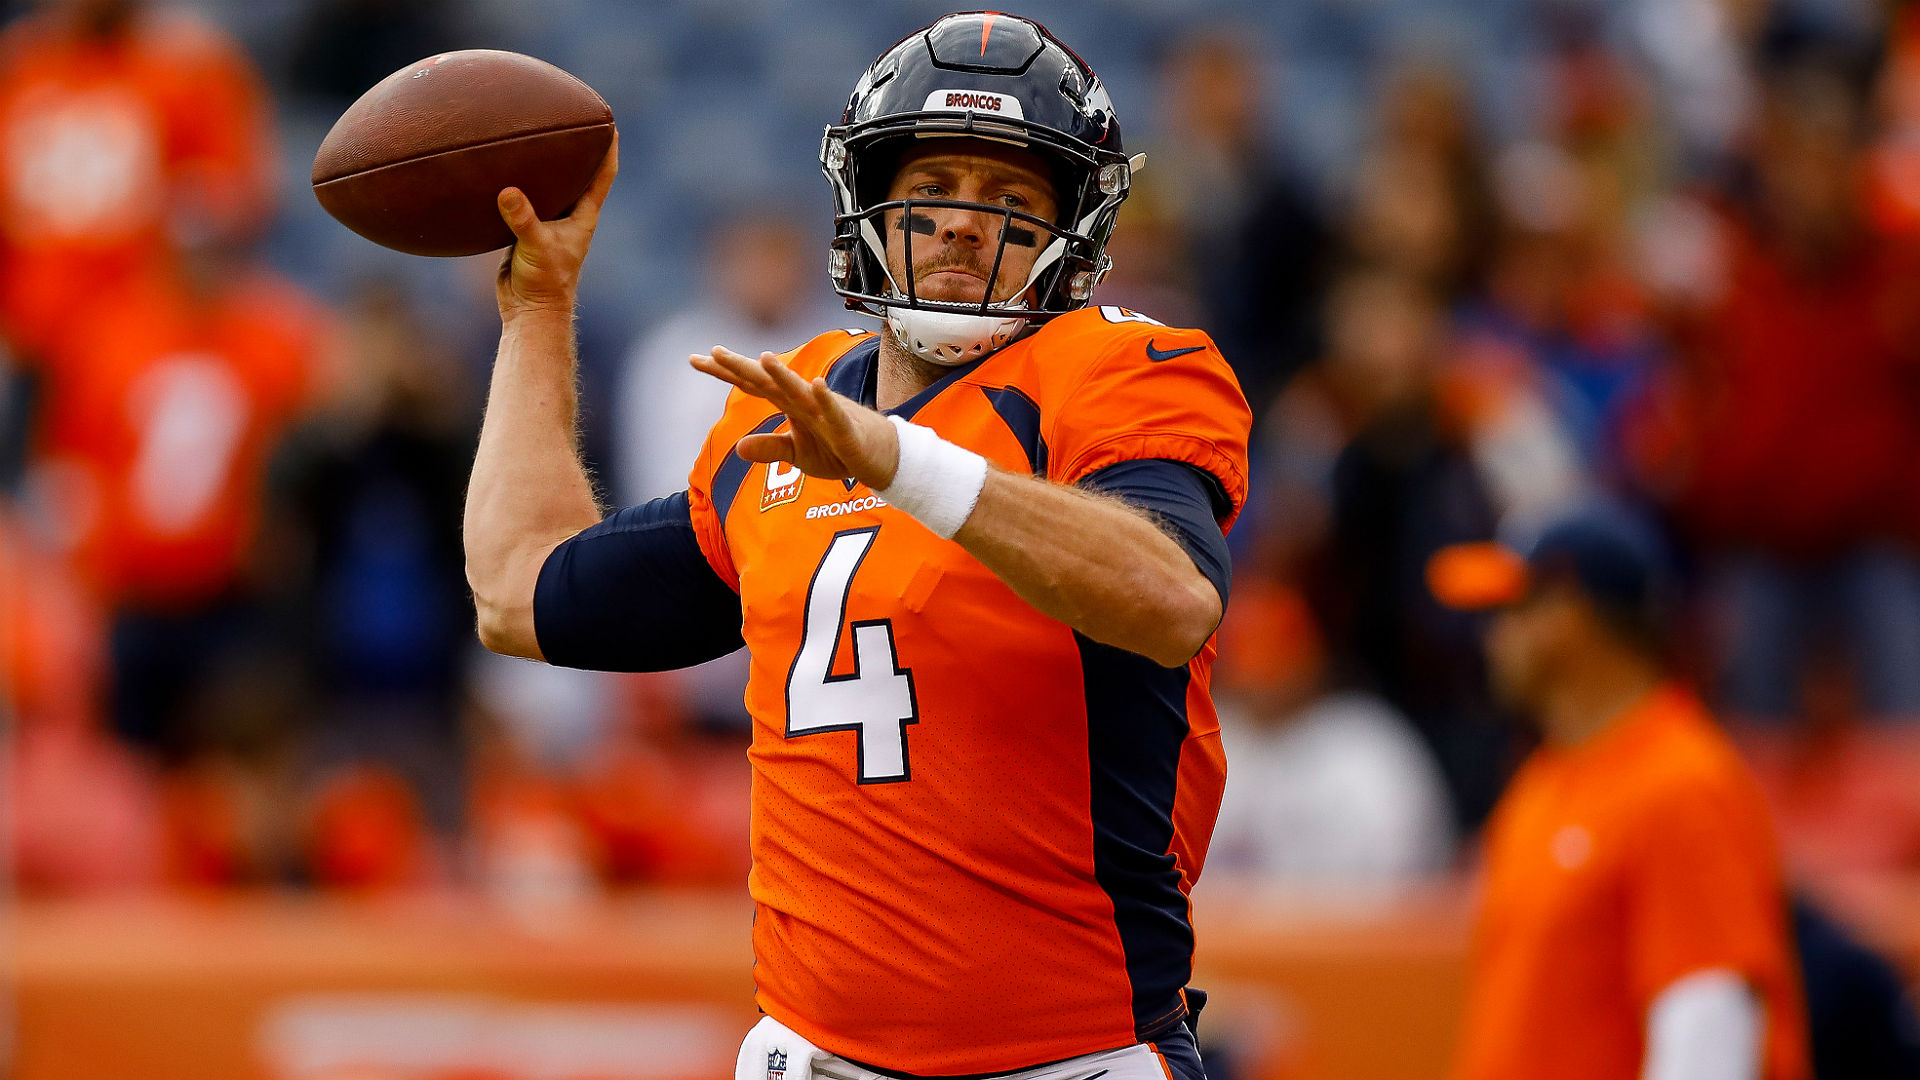 NFL trade rumors: Broncos to shop quarterback Case Keenum